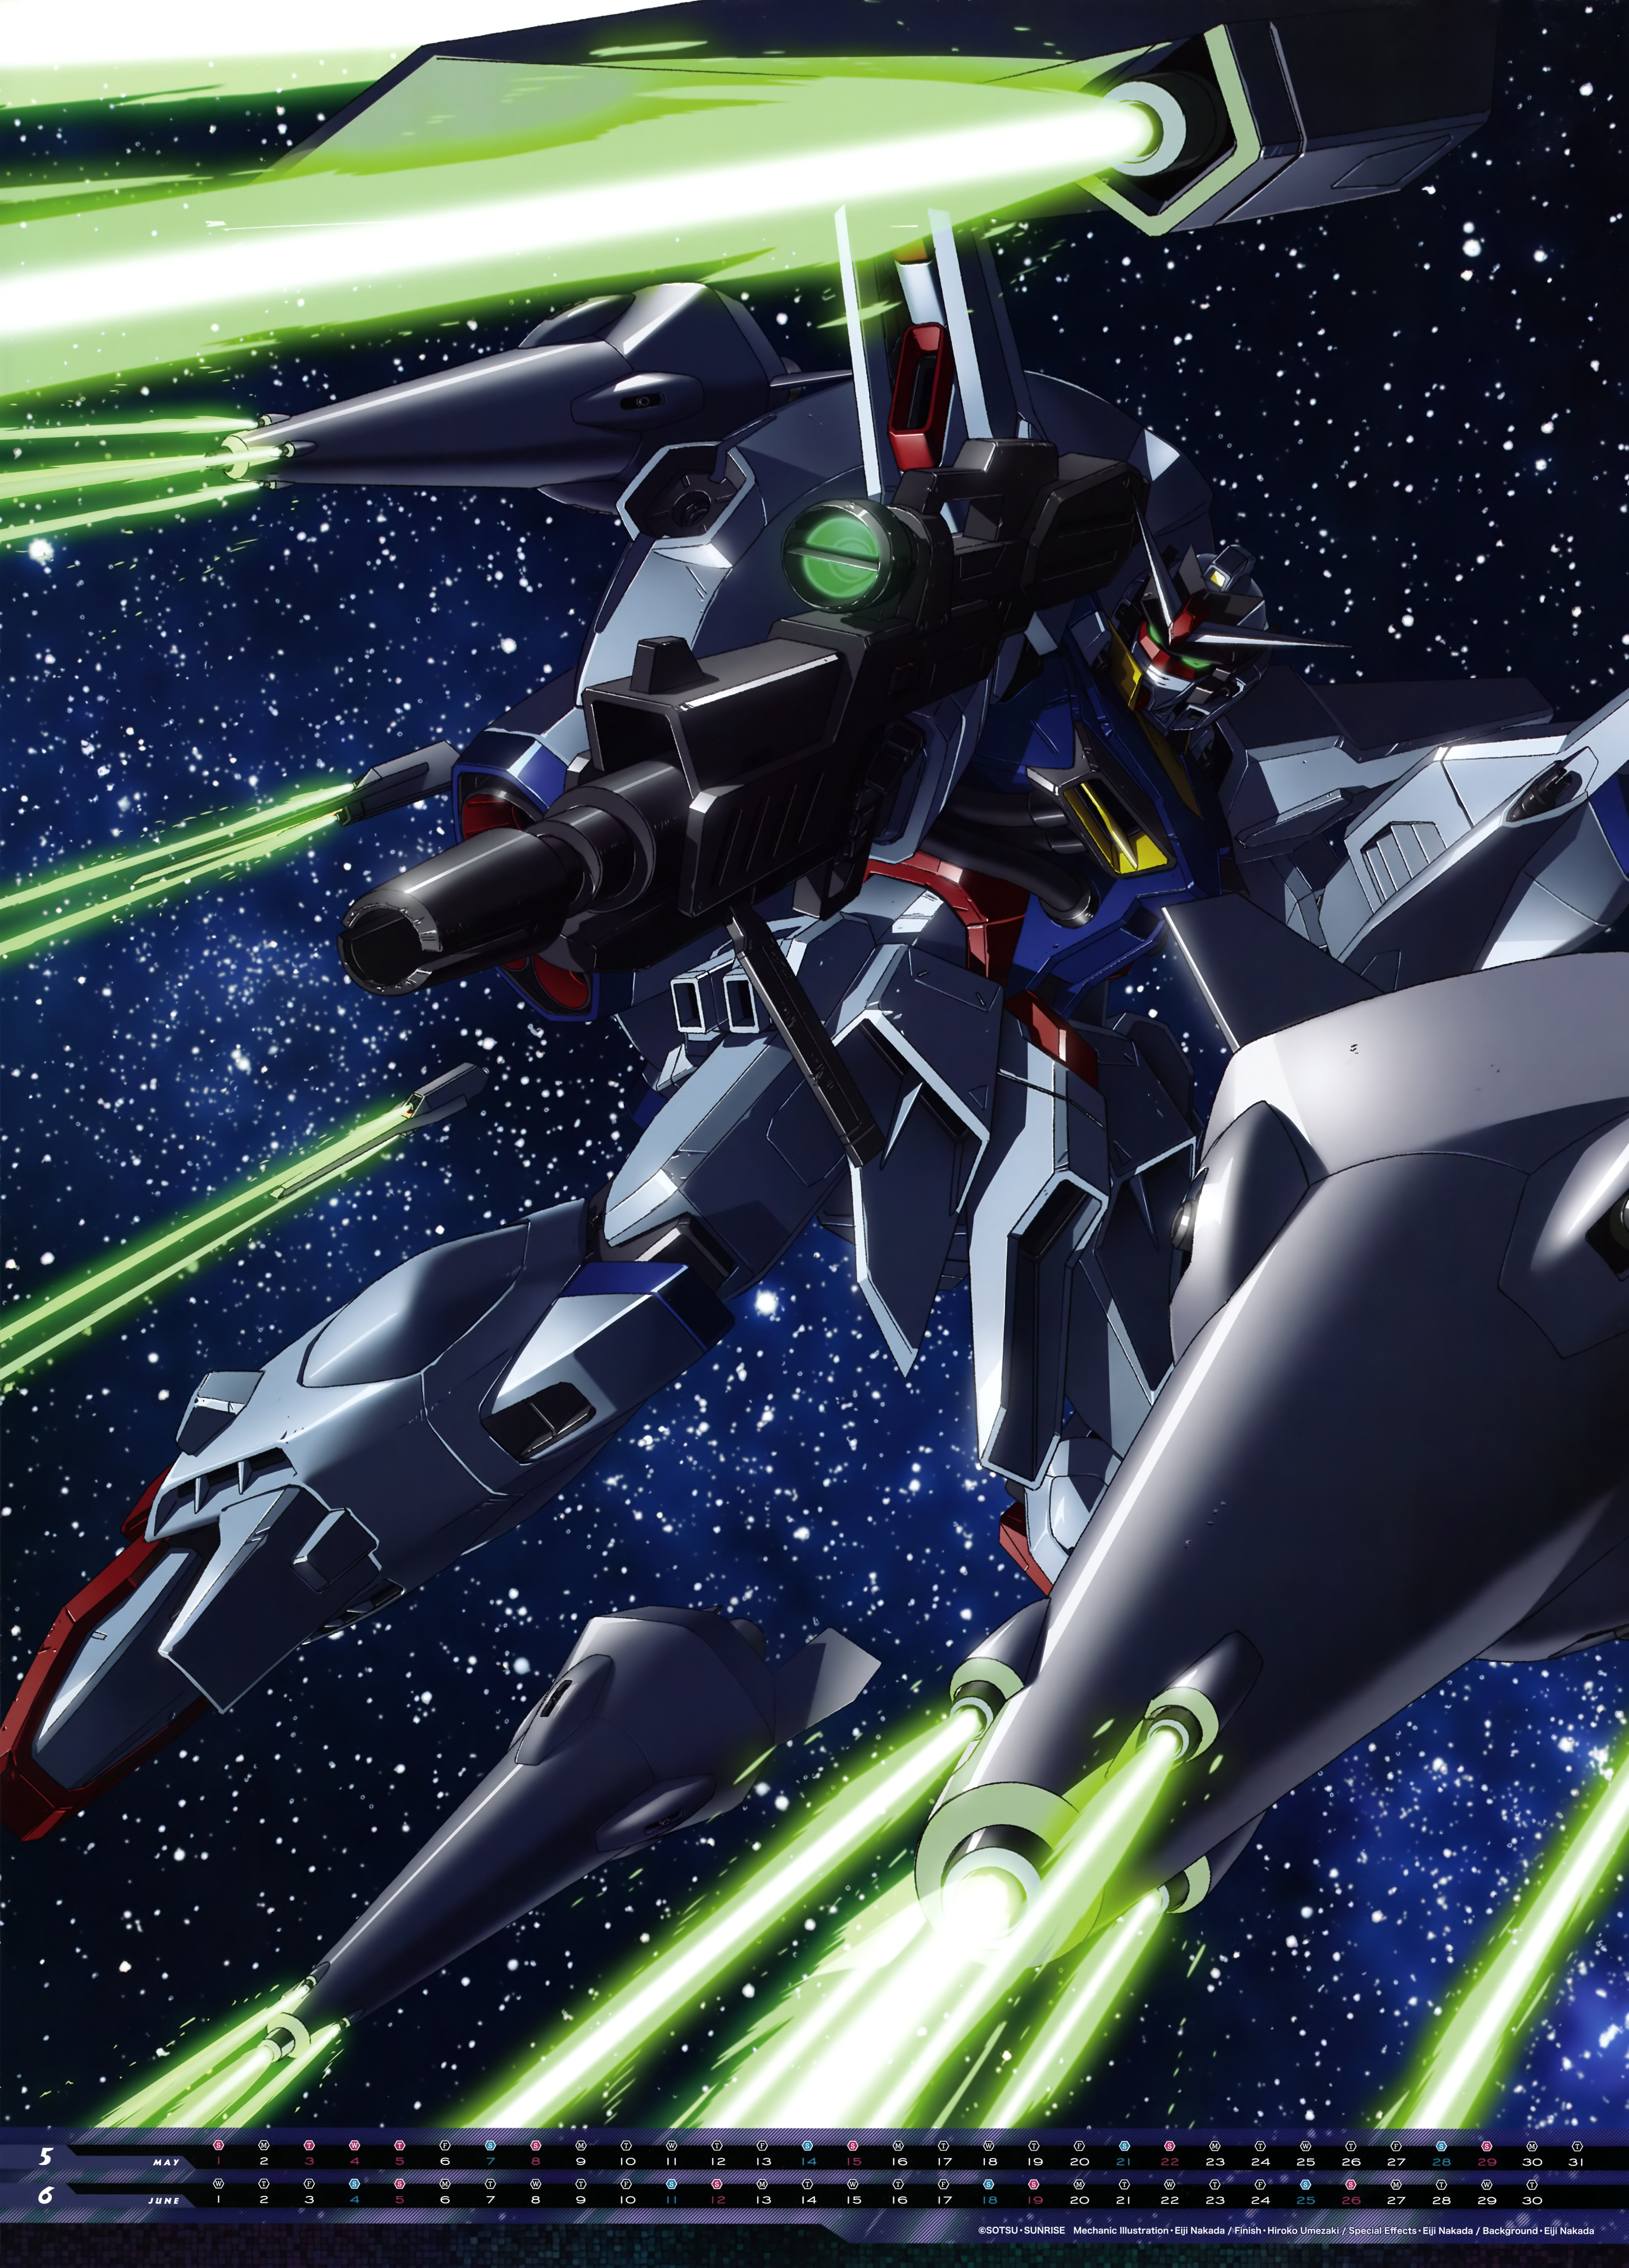 Mobile Suit Gundam Series anime Calendar 2016 0004